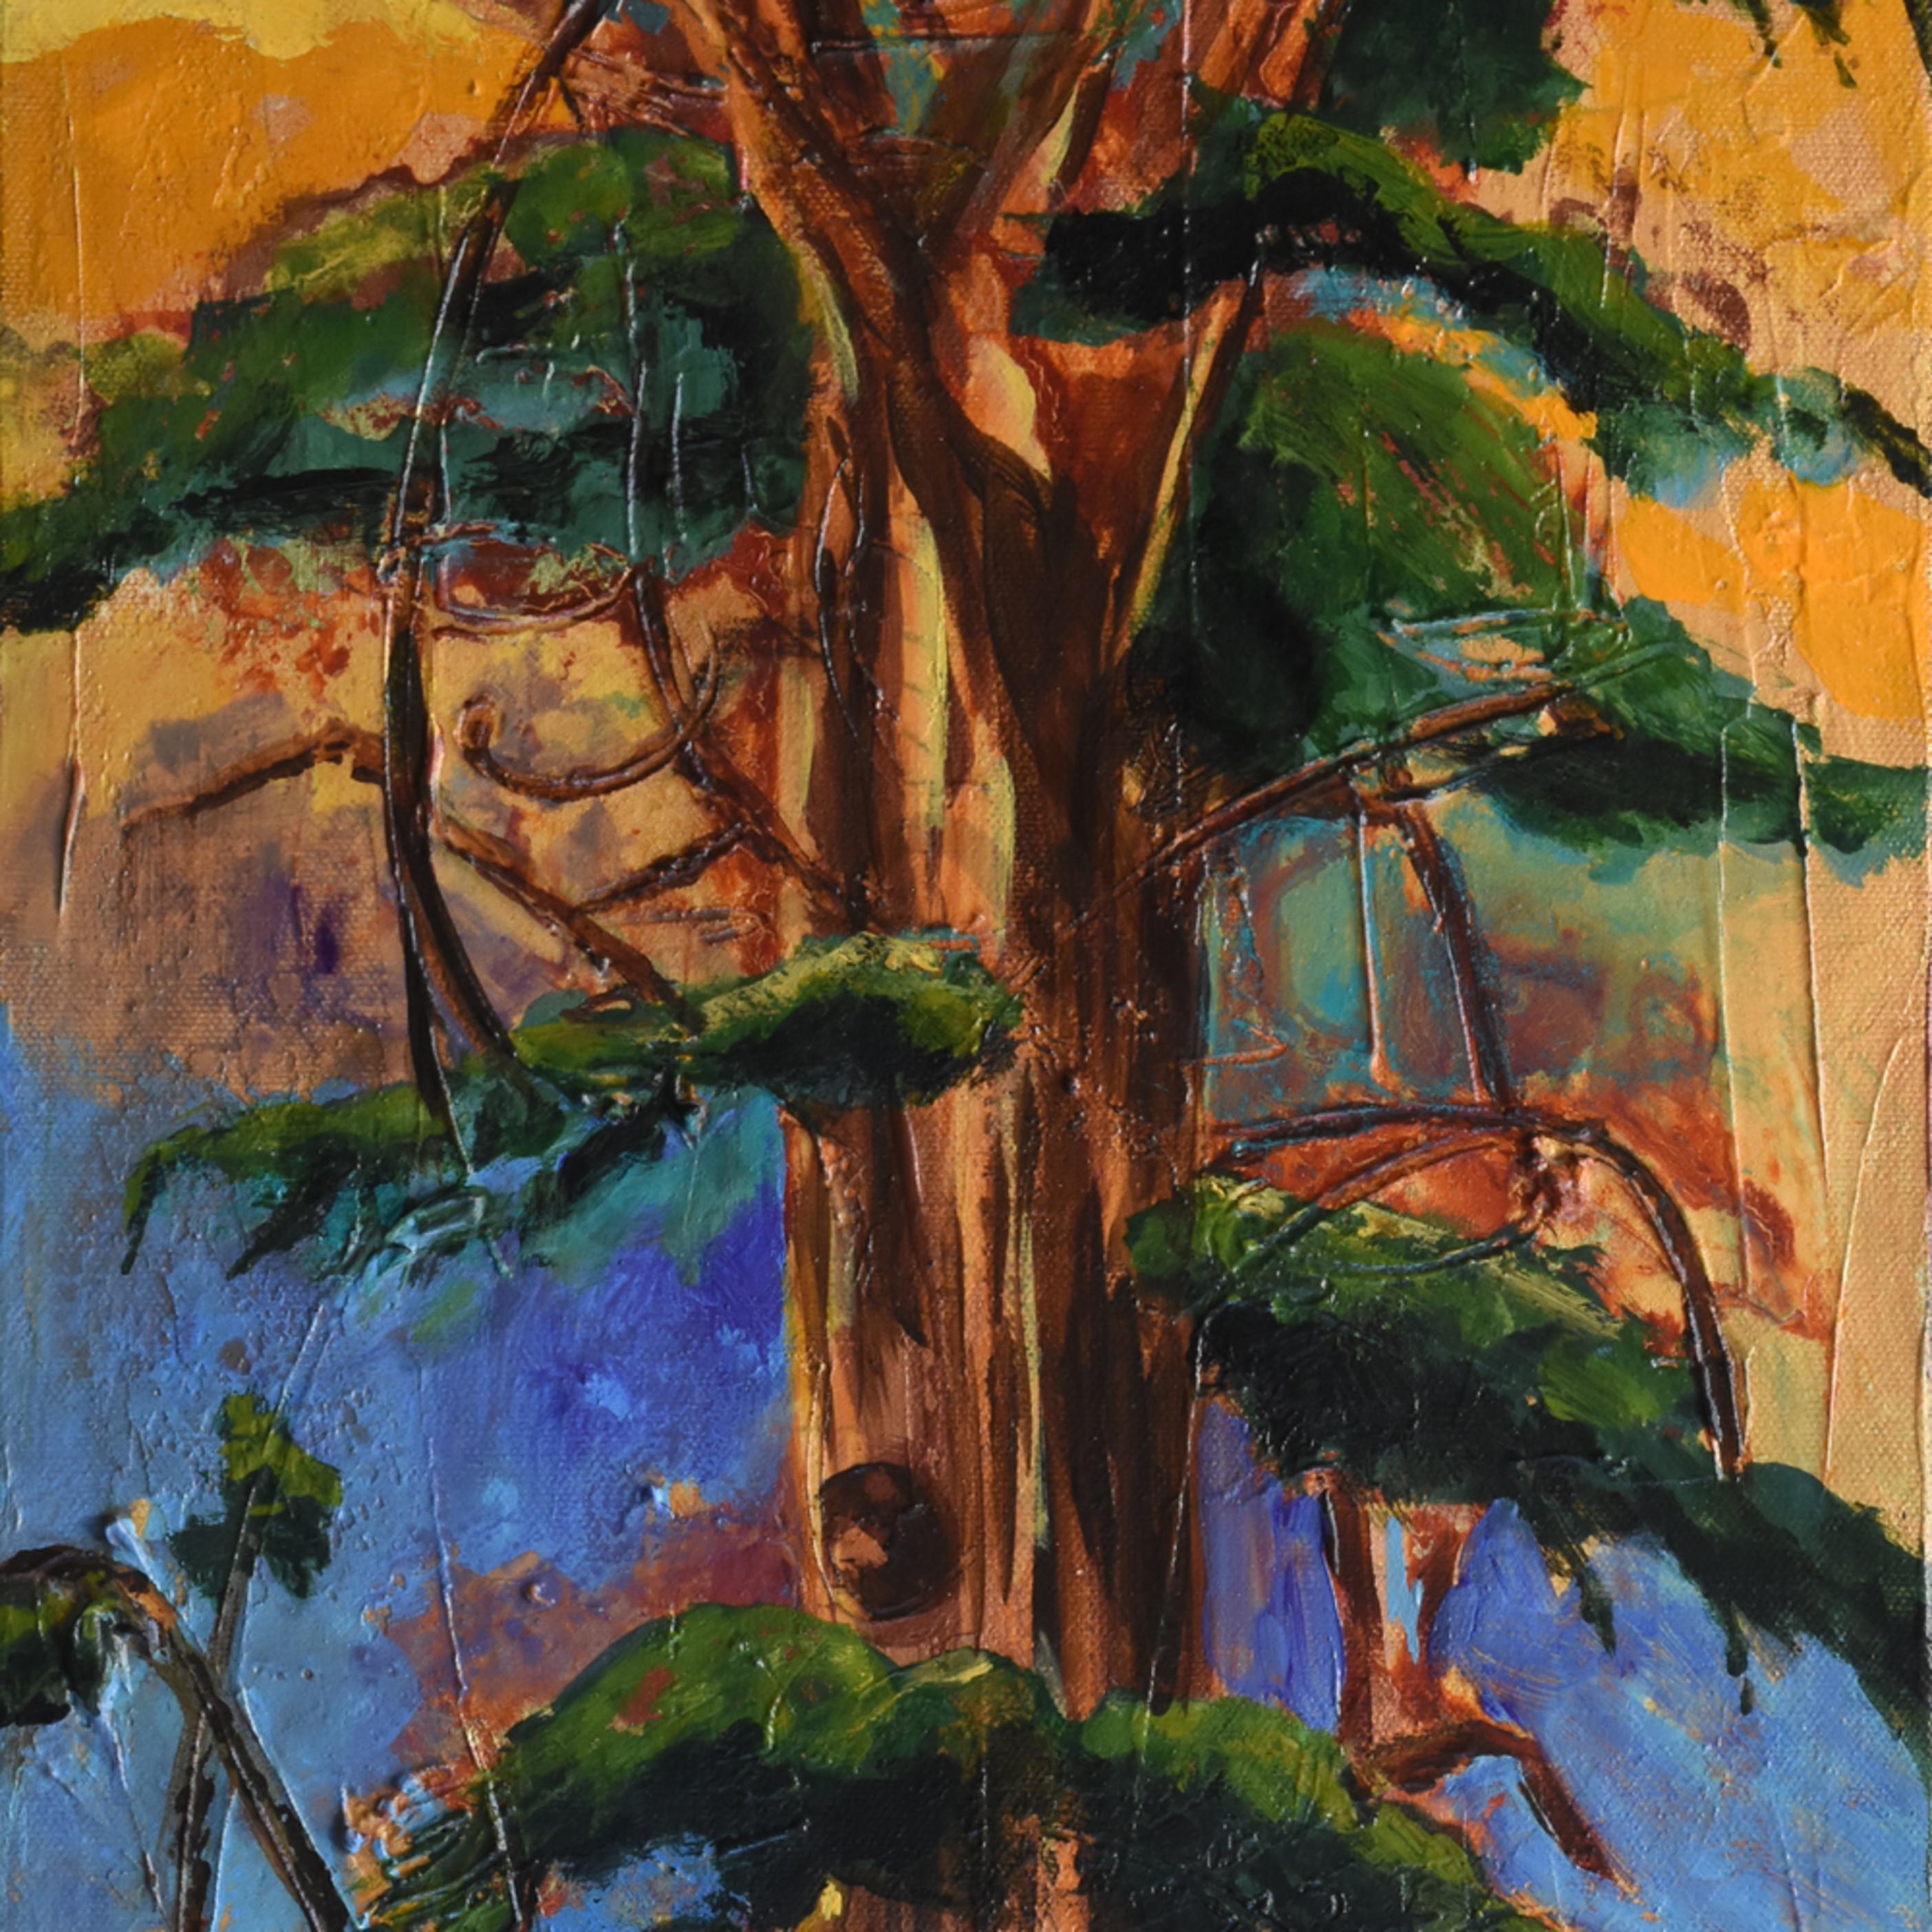 Ancestral tree nsynpq